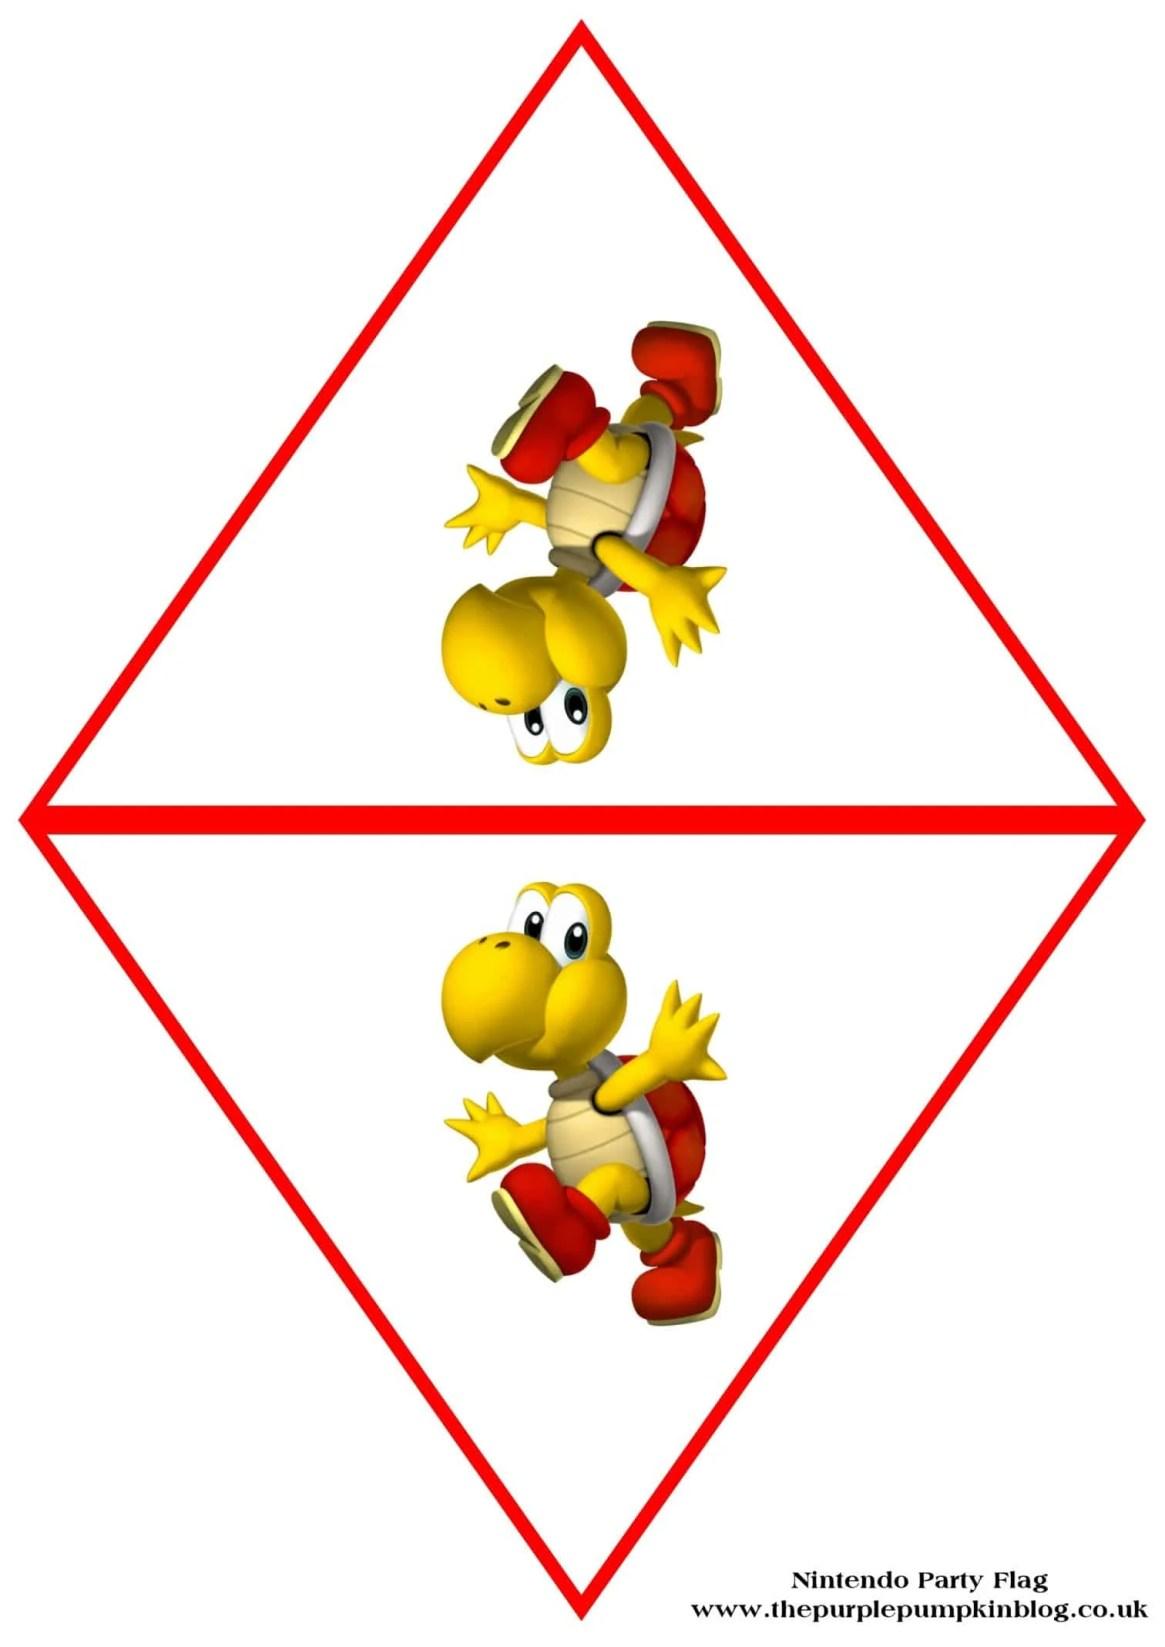 nintendo-party-flag-koopa-troopa